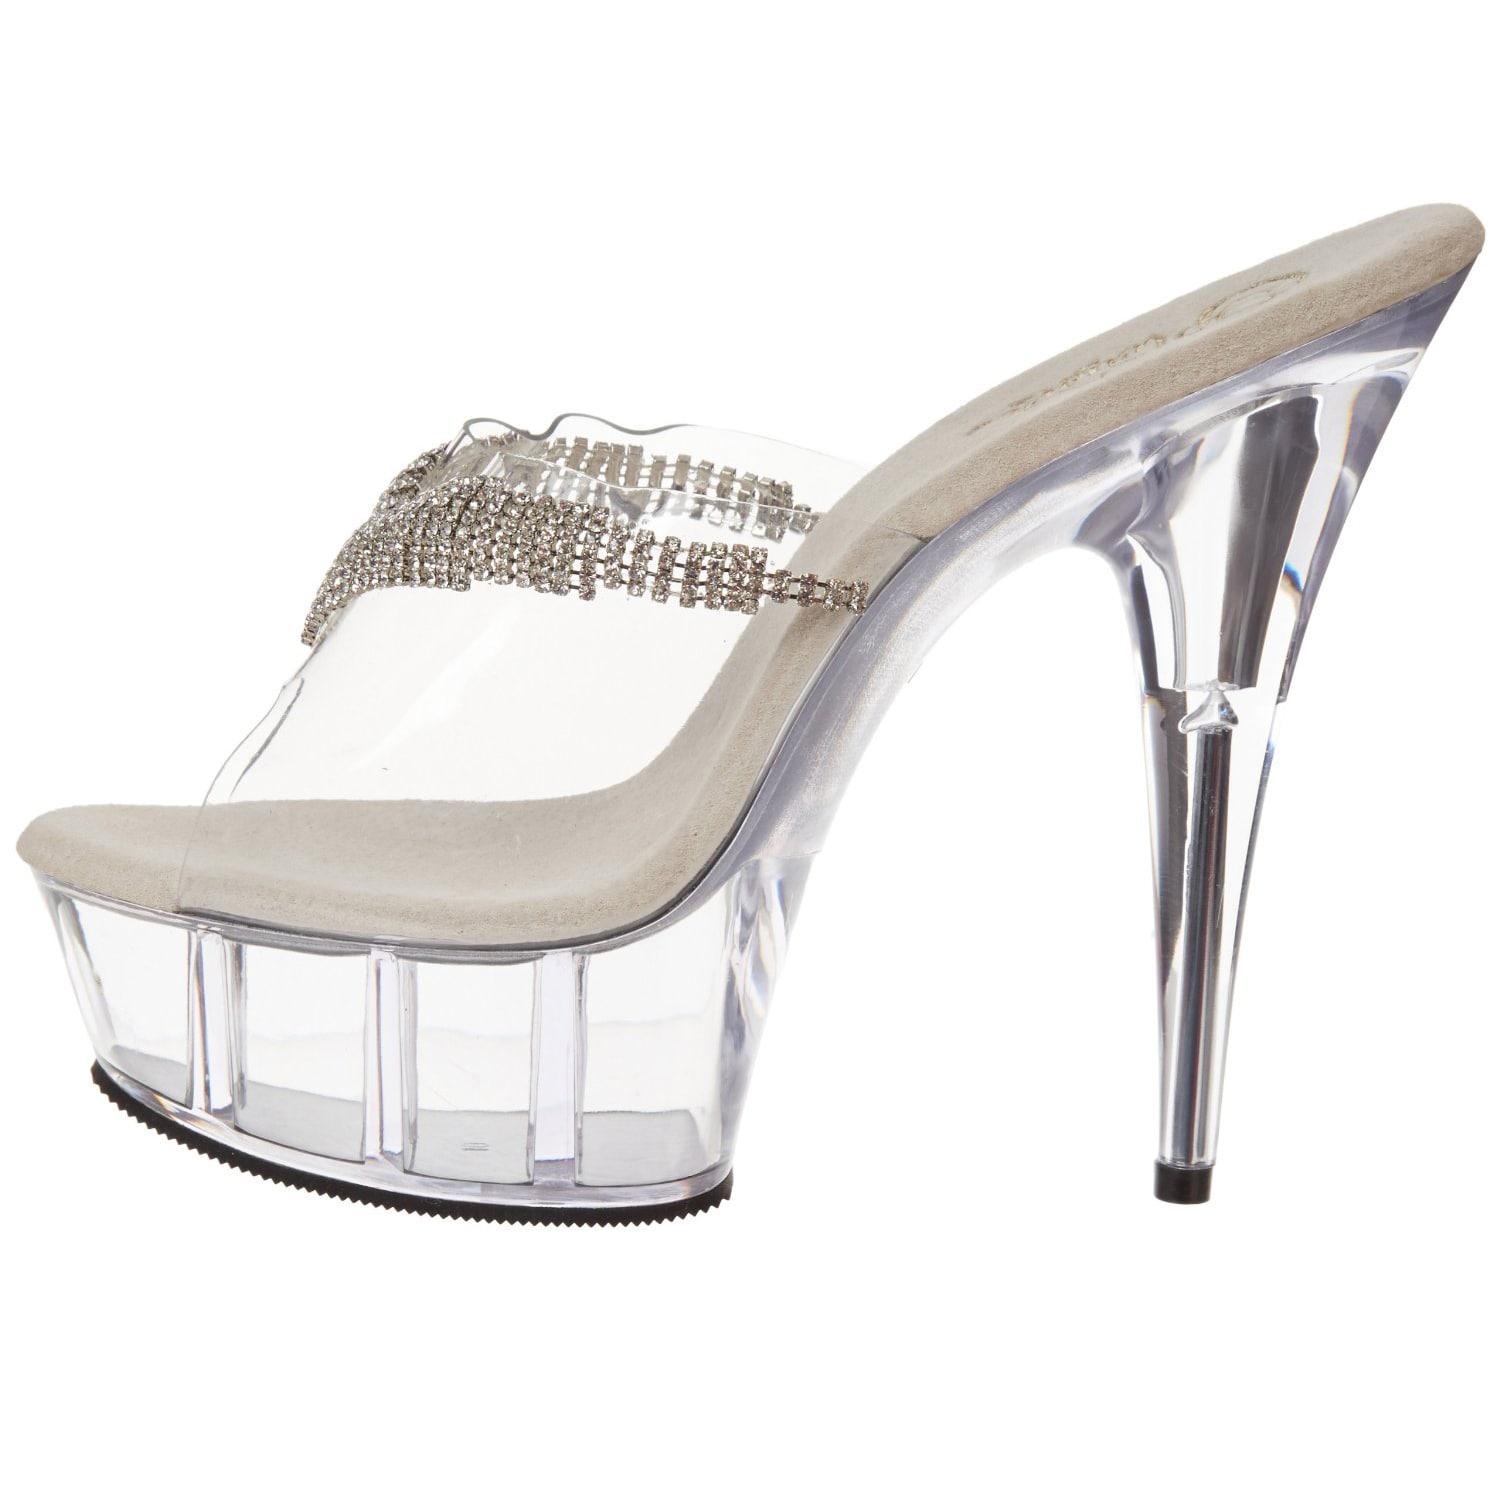 a84ecad5d8d3 Shop Pleaser Women s  Delight-601-5  Clear Lucite Platform Slide Sandals -  Free Shipping Today - Overstock - 8428763